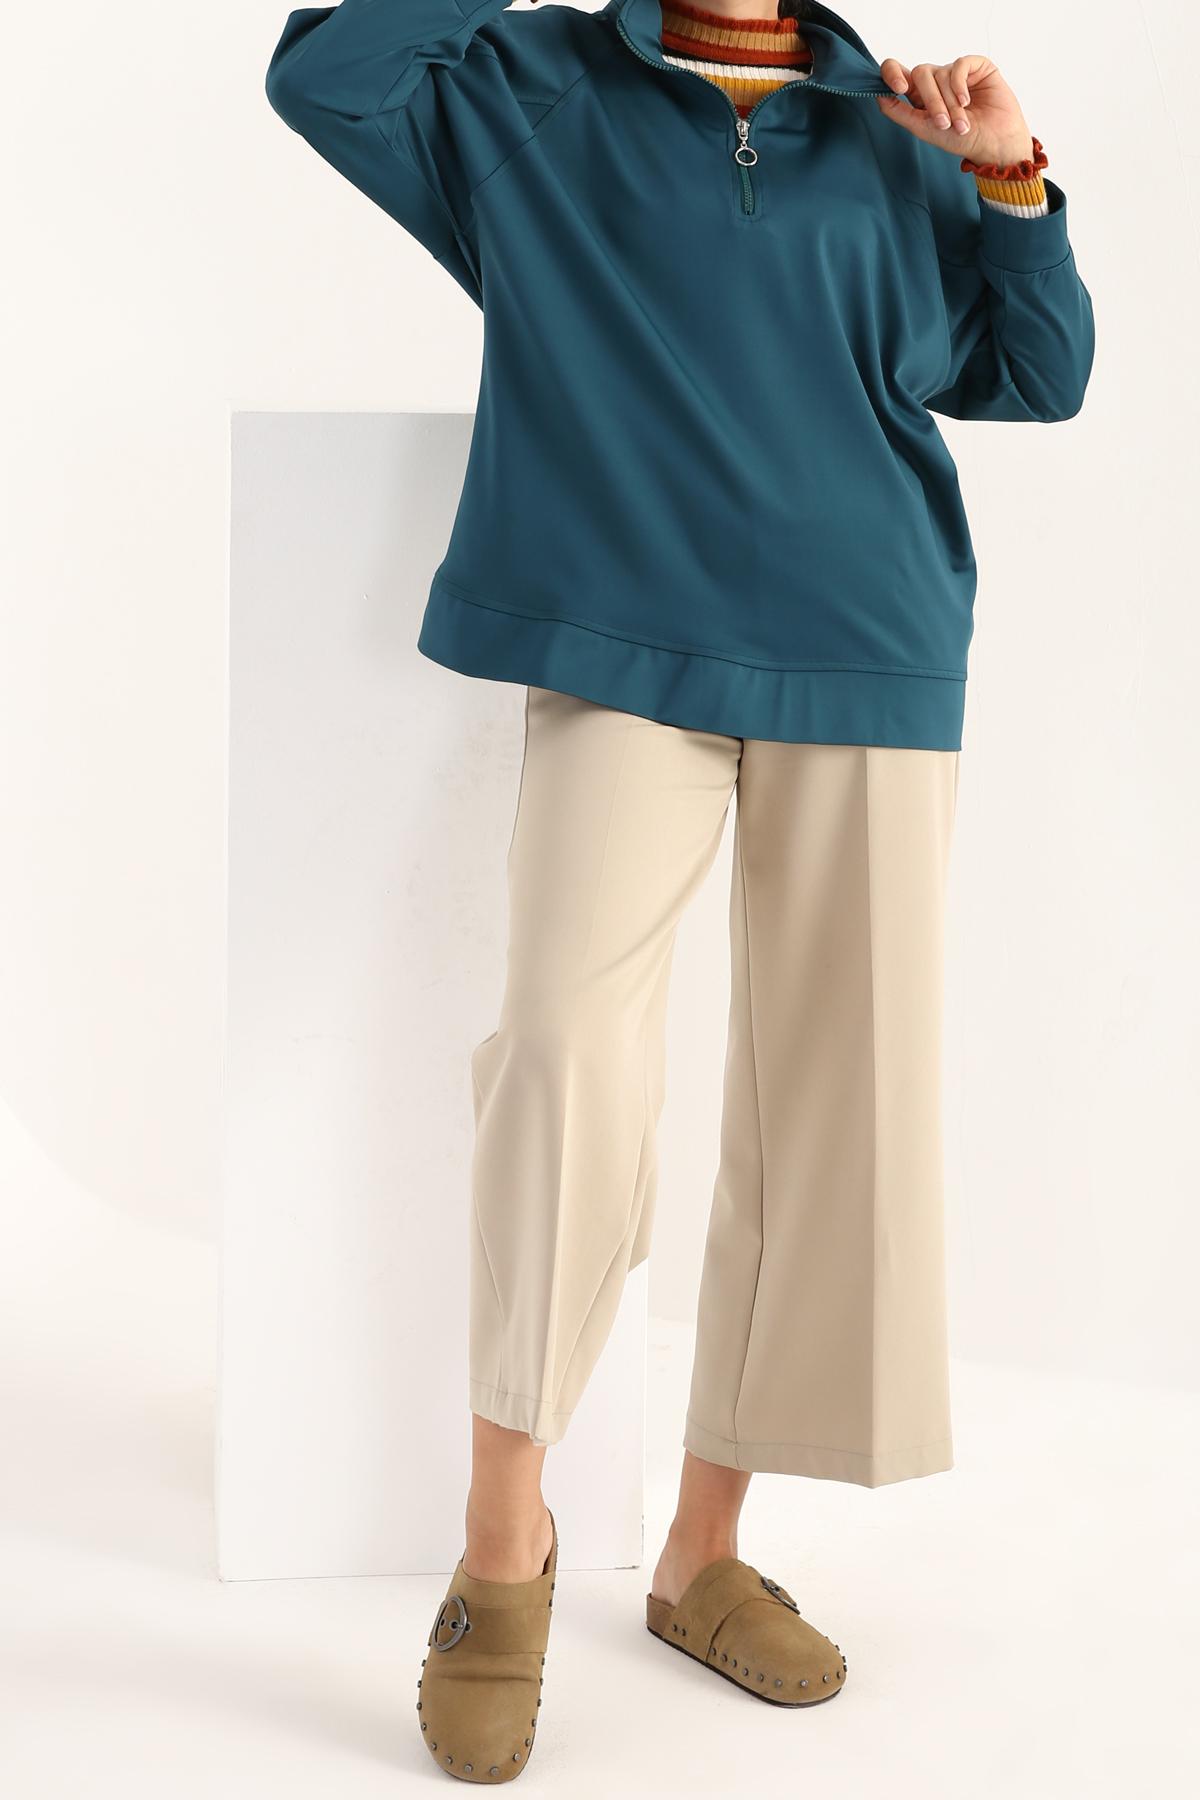 Raglan Sleeve Zipper Detailed Sweatshirt